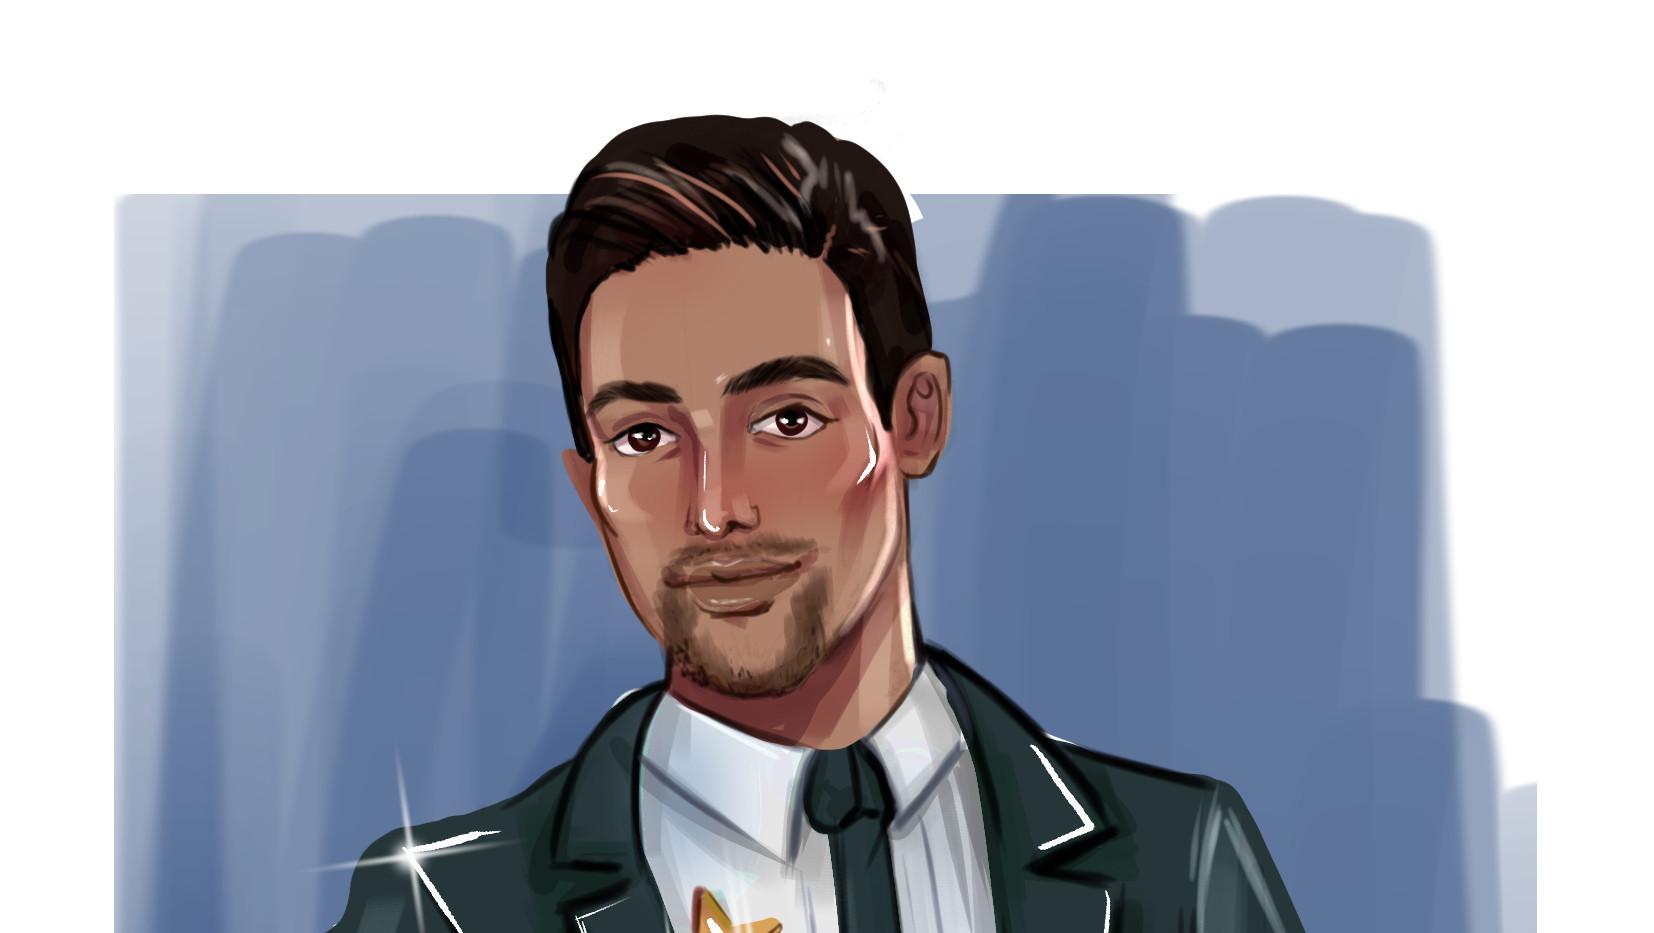 Illustration Award Male Indian.jpg